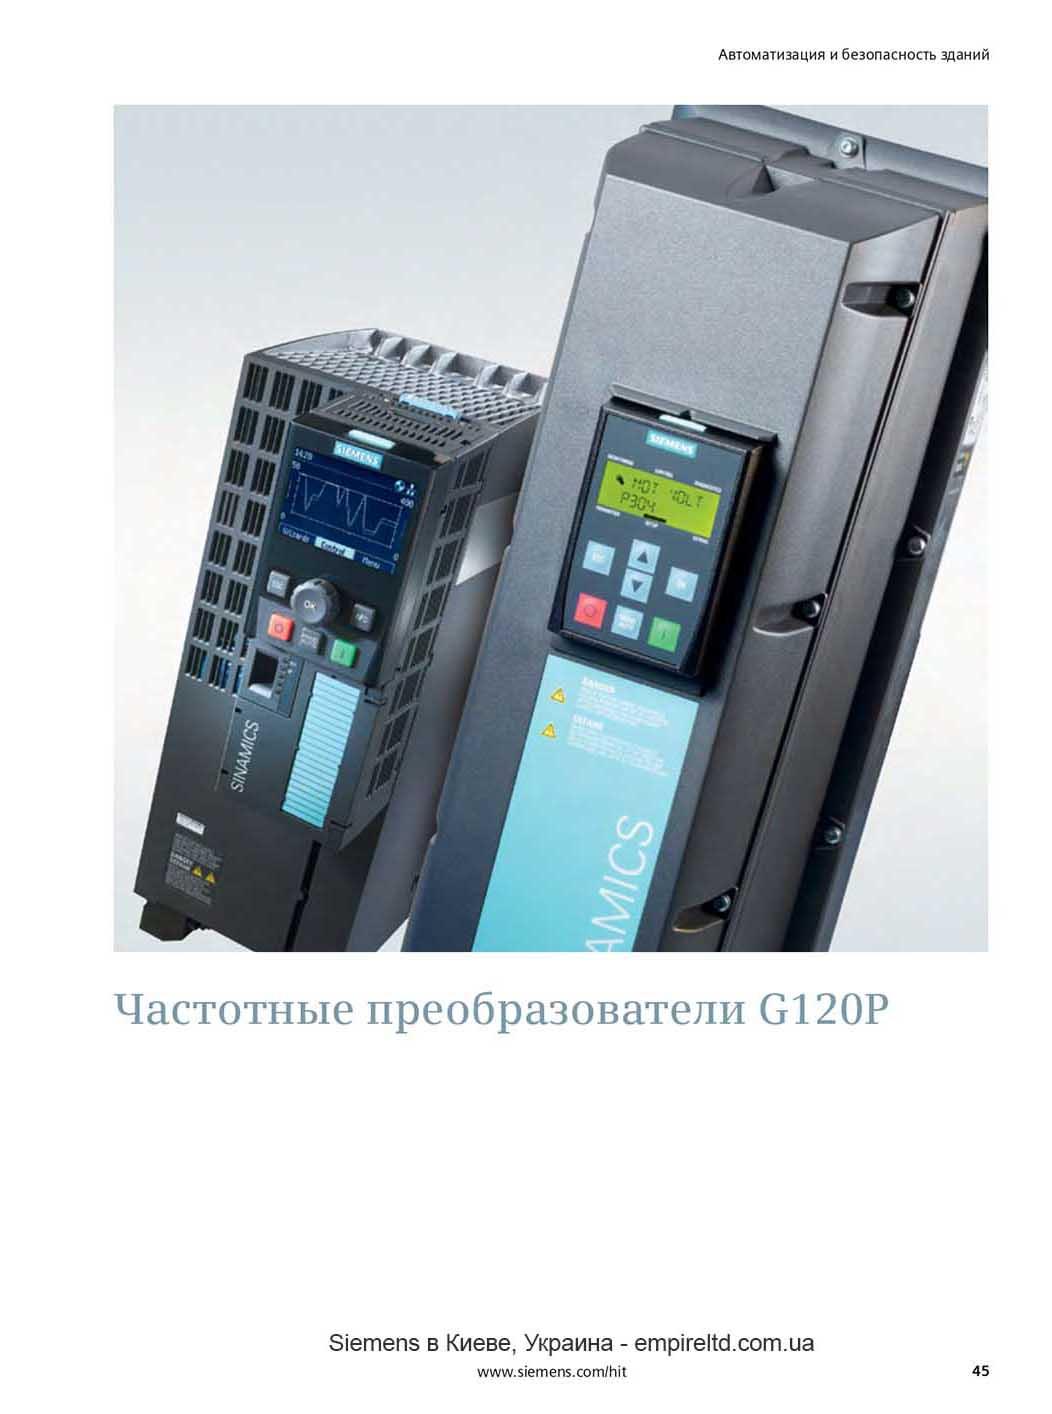 siemens-kiev-ukraine-0024-1